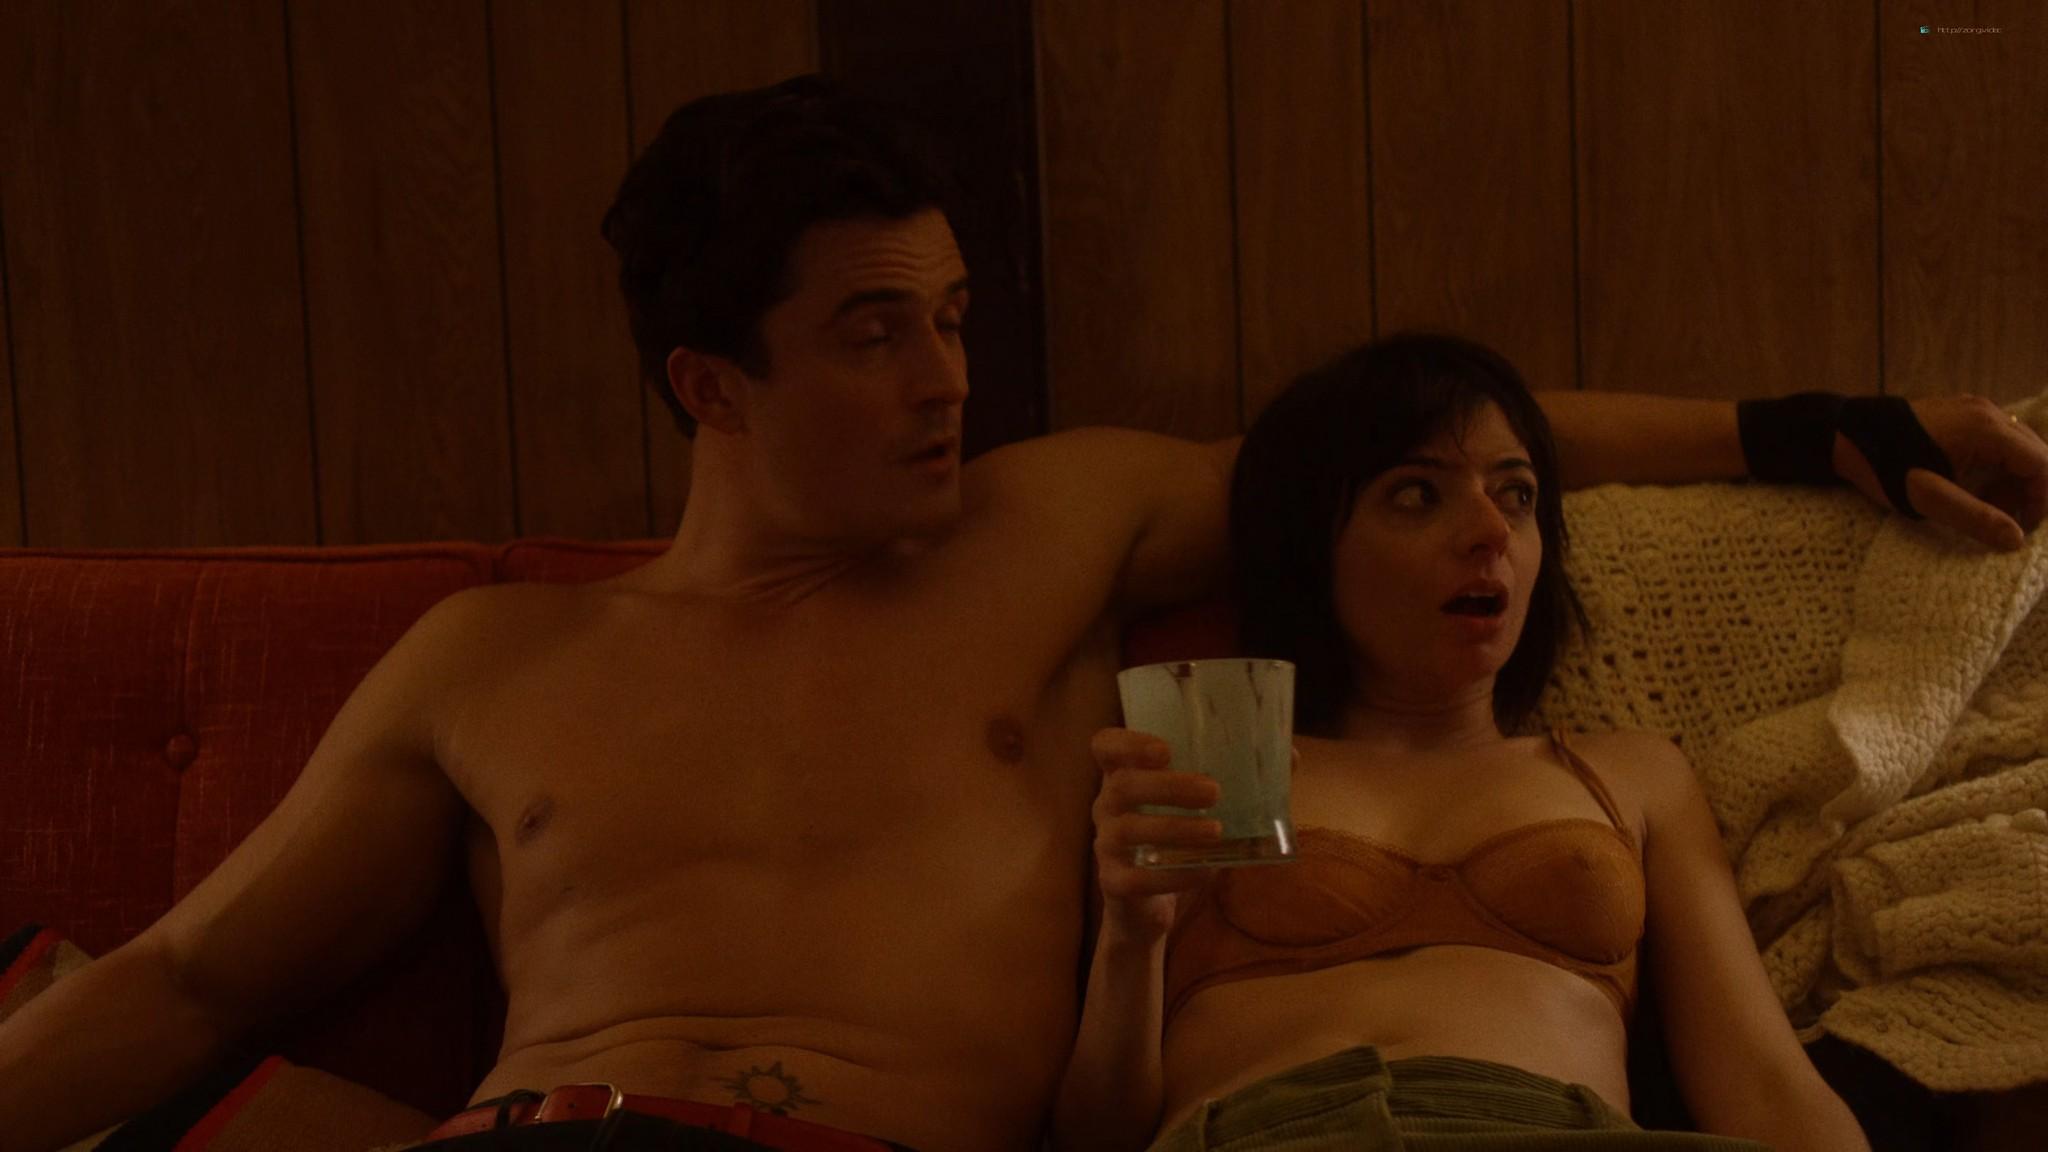 Malin Akerman nude sex threesome with Kate Micucci Easy 2016 s1e6 UHD 2160 1080p 003